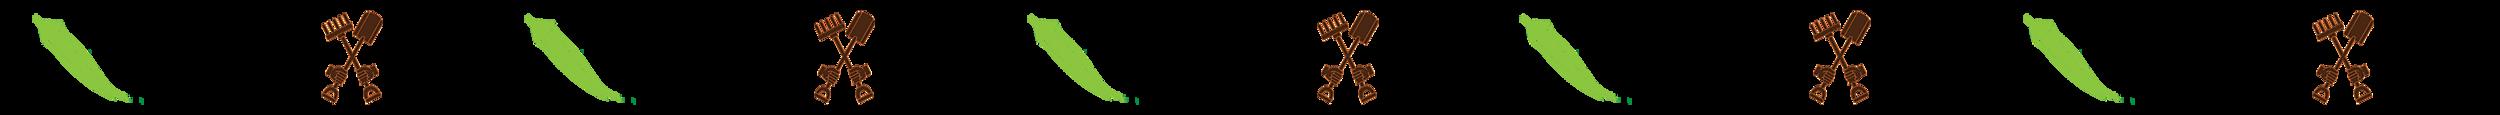 UVP Divider2.png